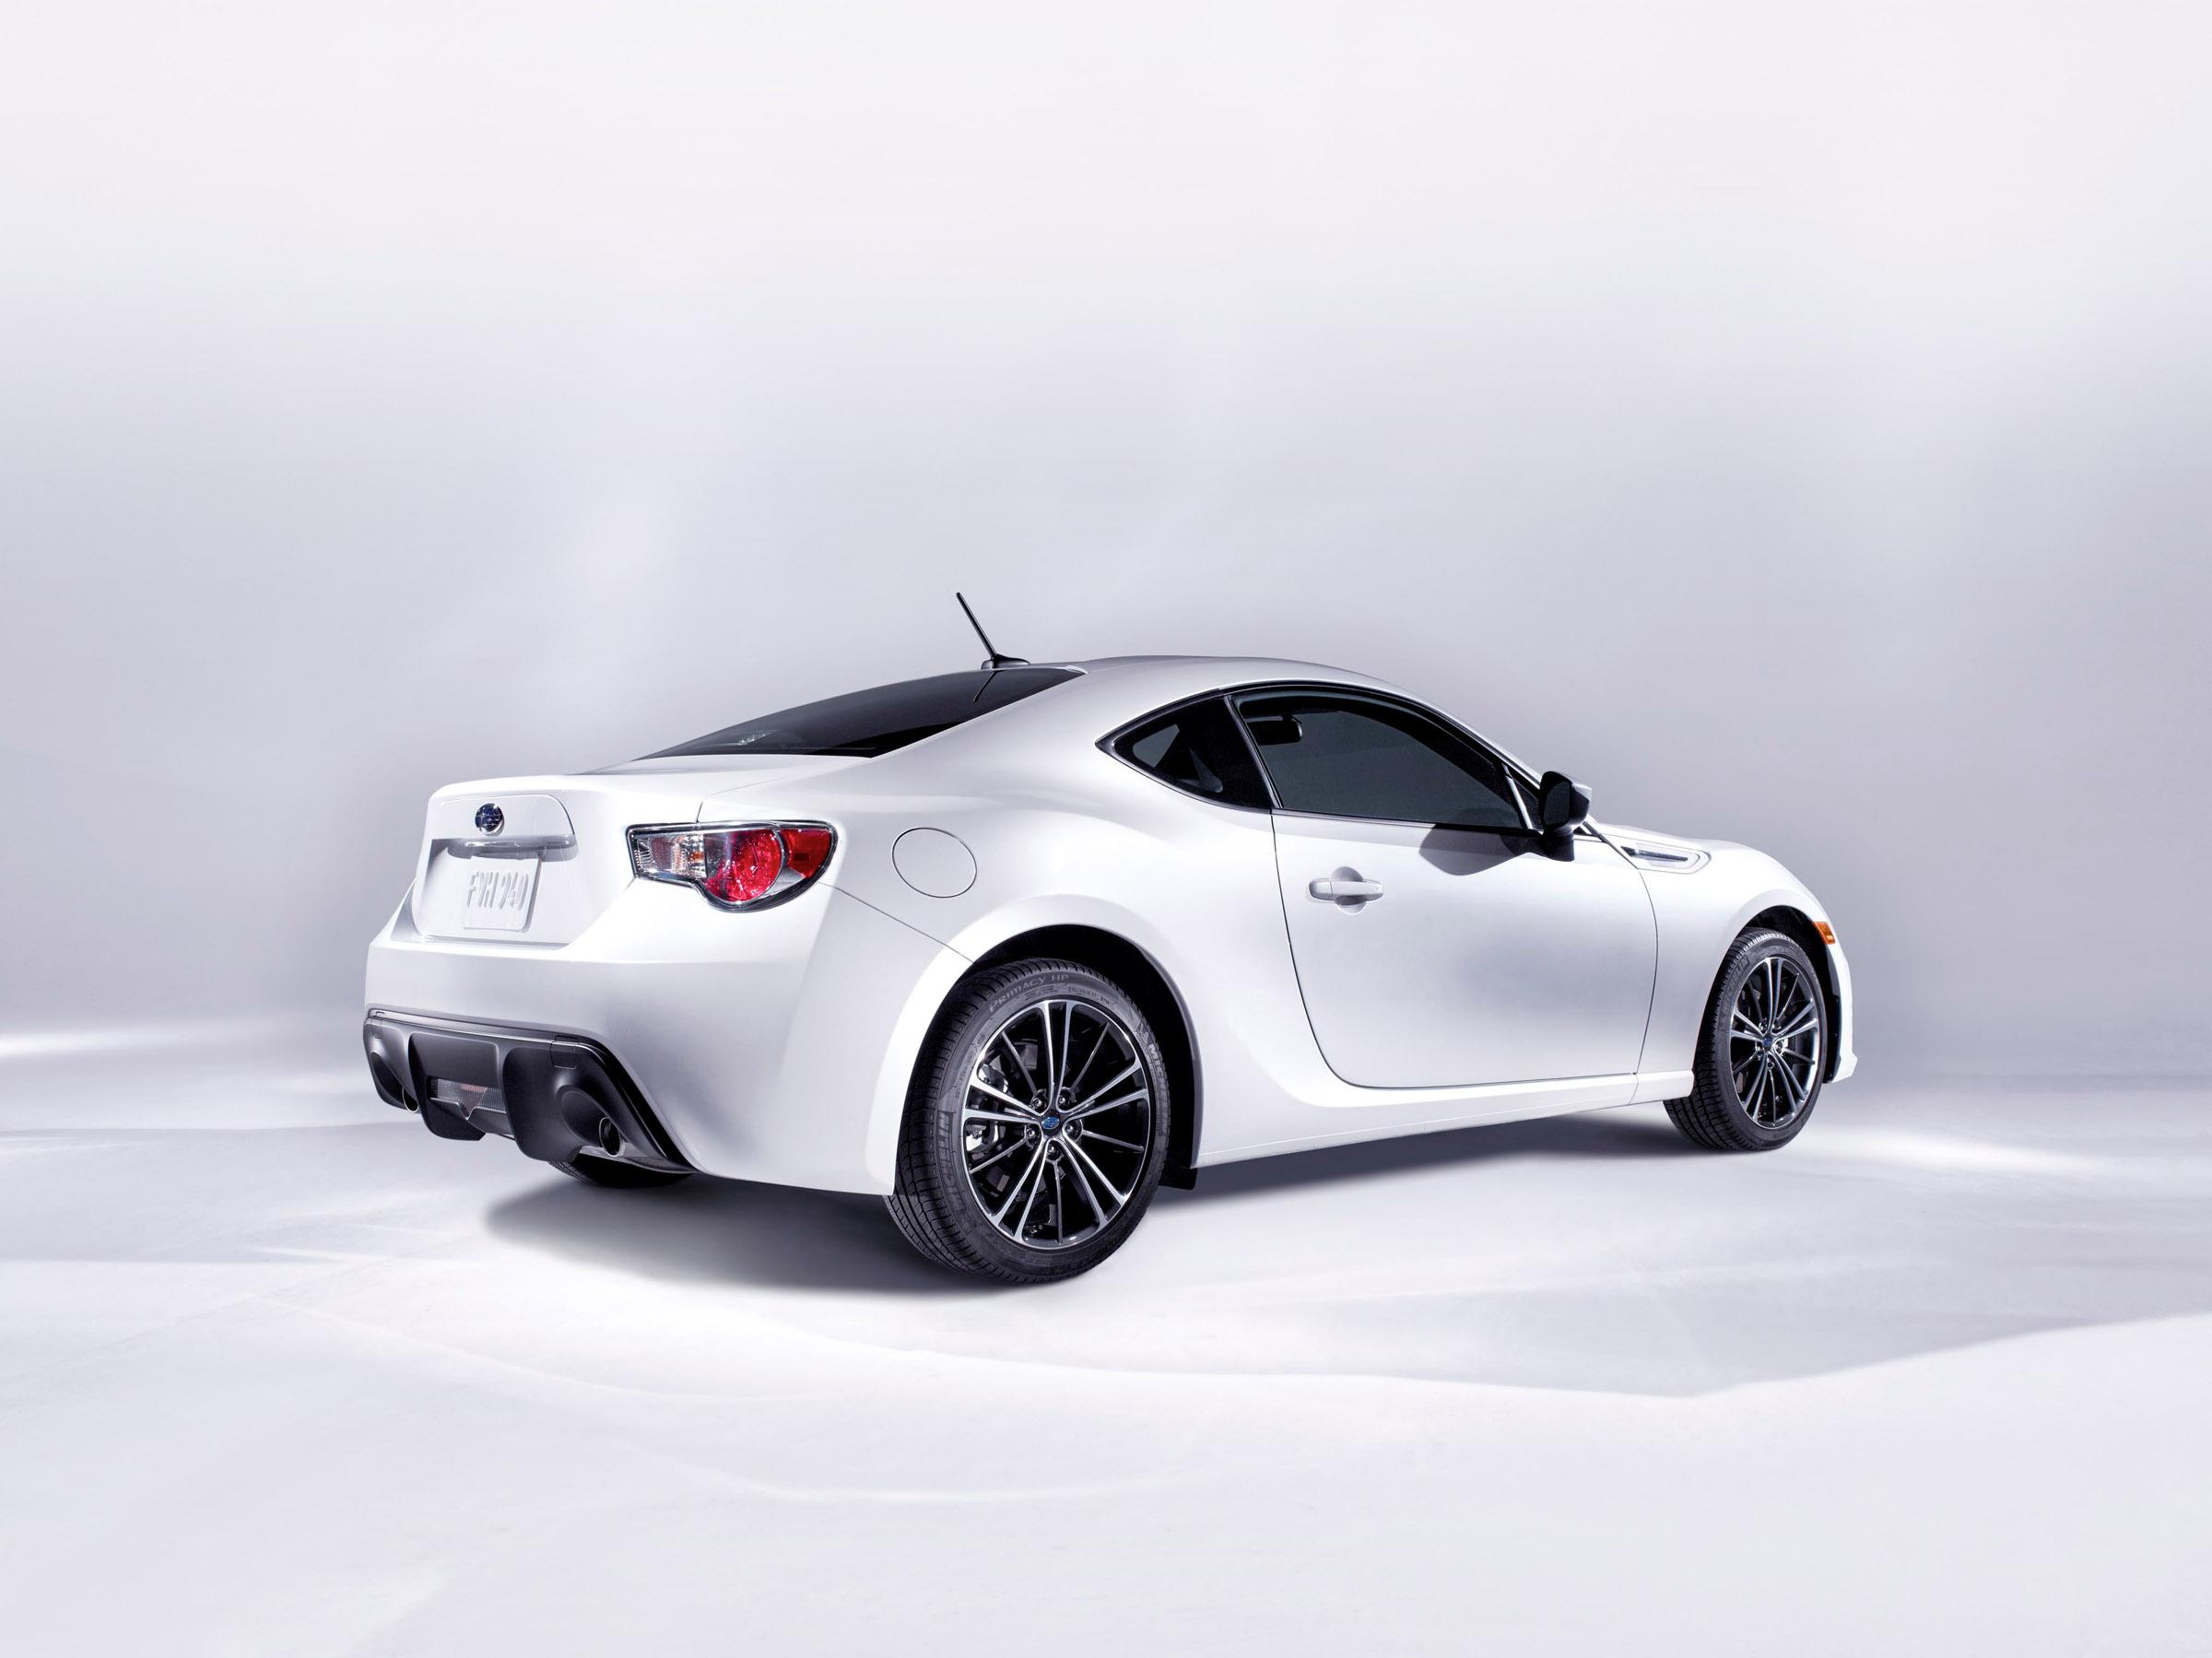 2013 Subaru Brz Sports Car Comes Offering Unique Driving